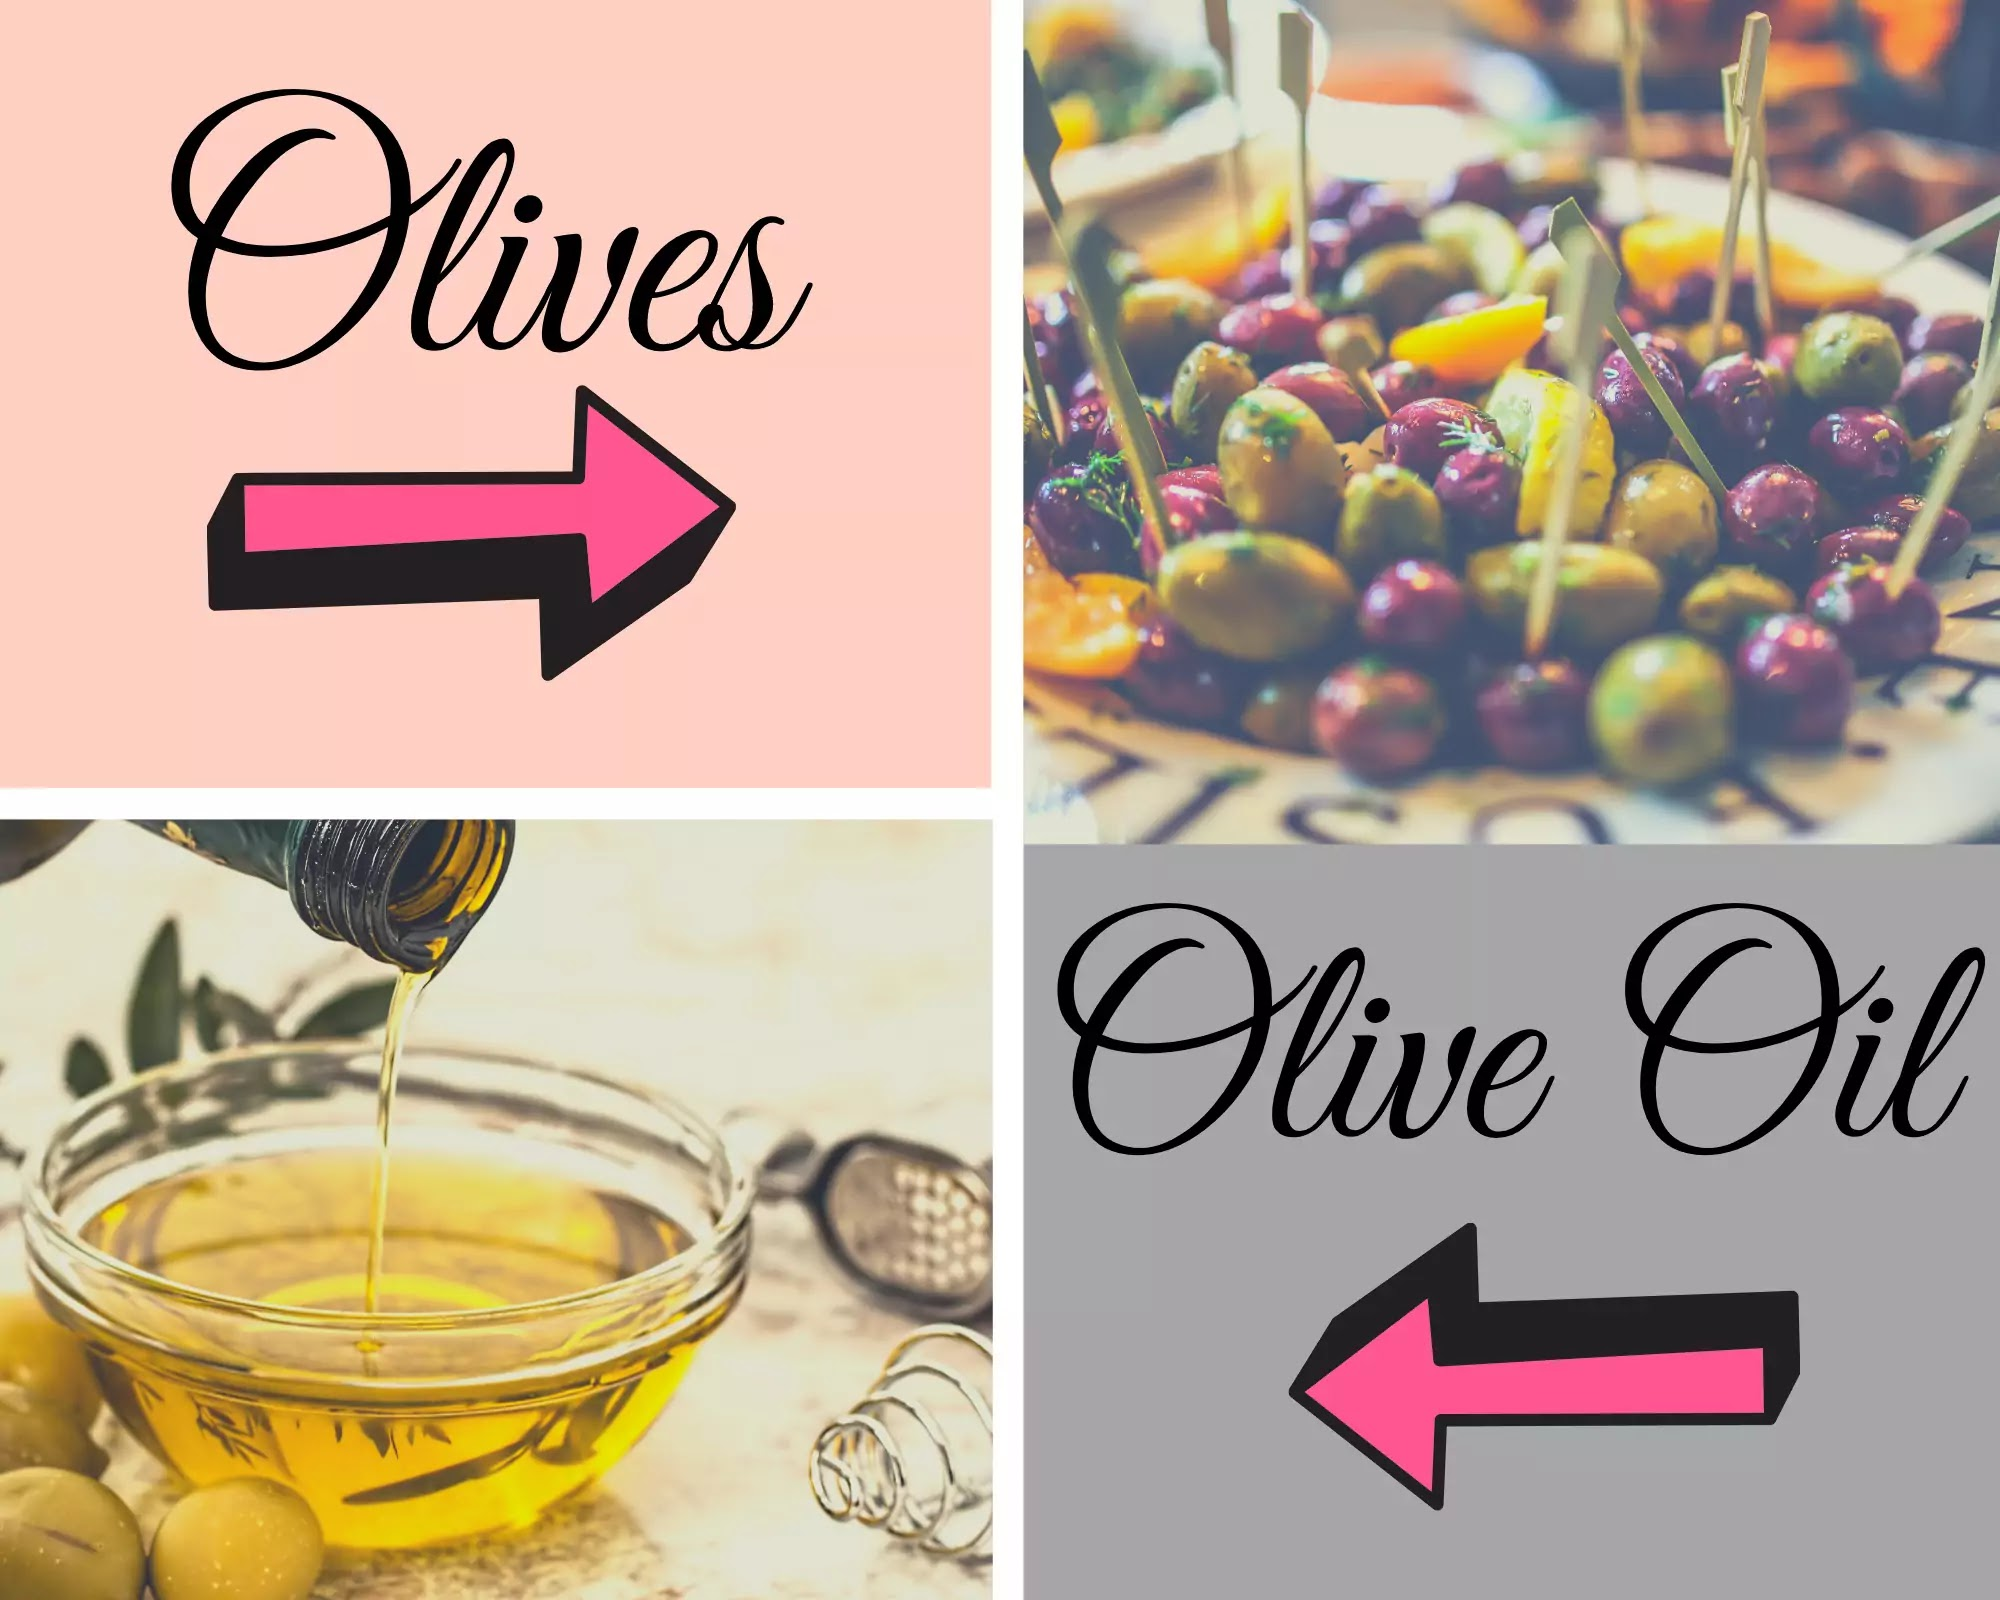 Olives and olive oil - benefits of olive oil